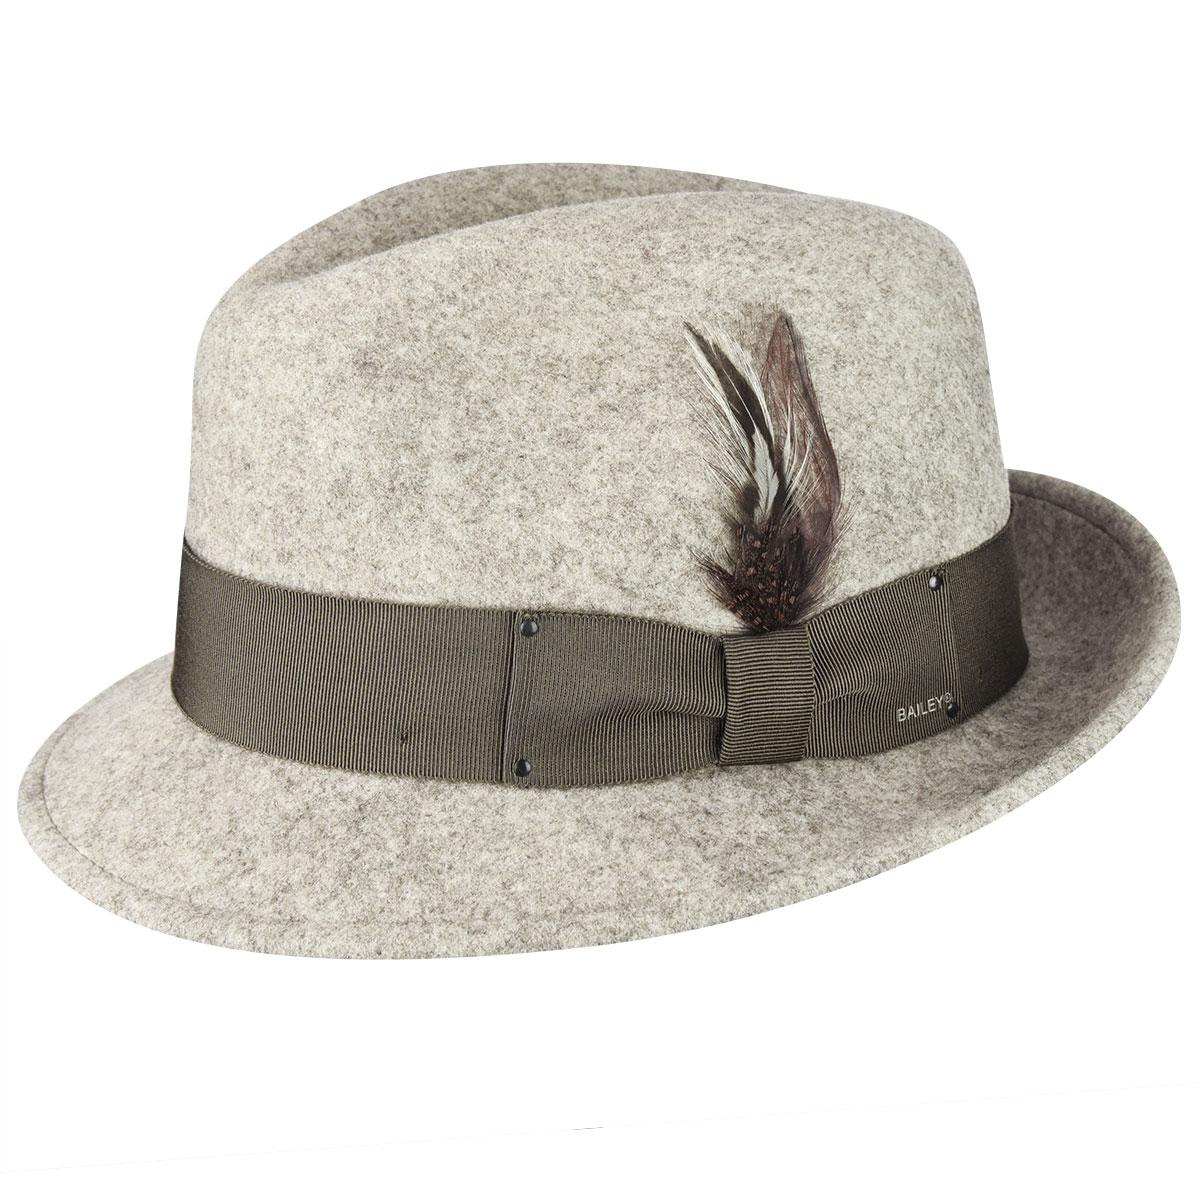 Men's Vintage Style Hats, Retro Hats Tino LiteFeltFedora $100.00 AT vintagedancer.com